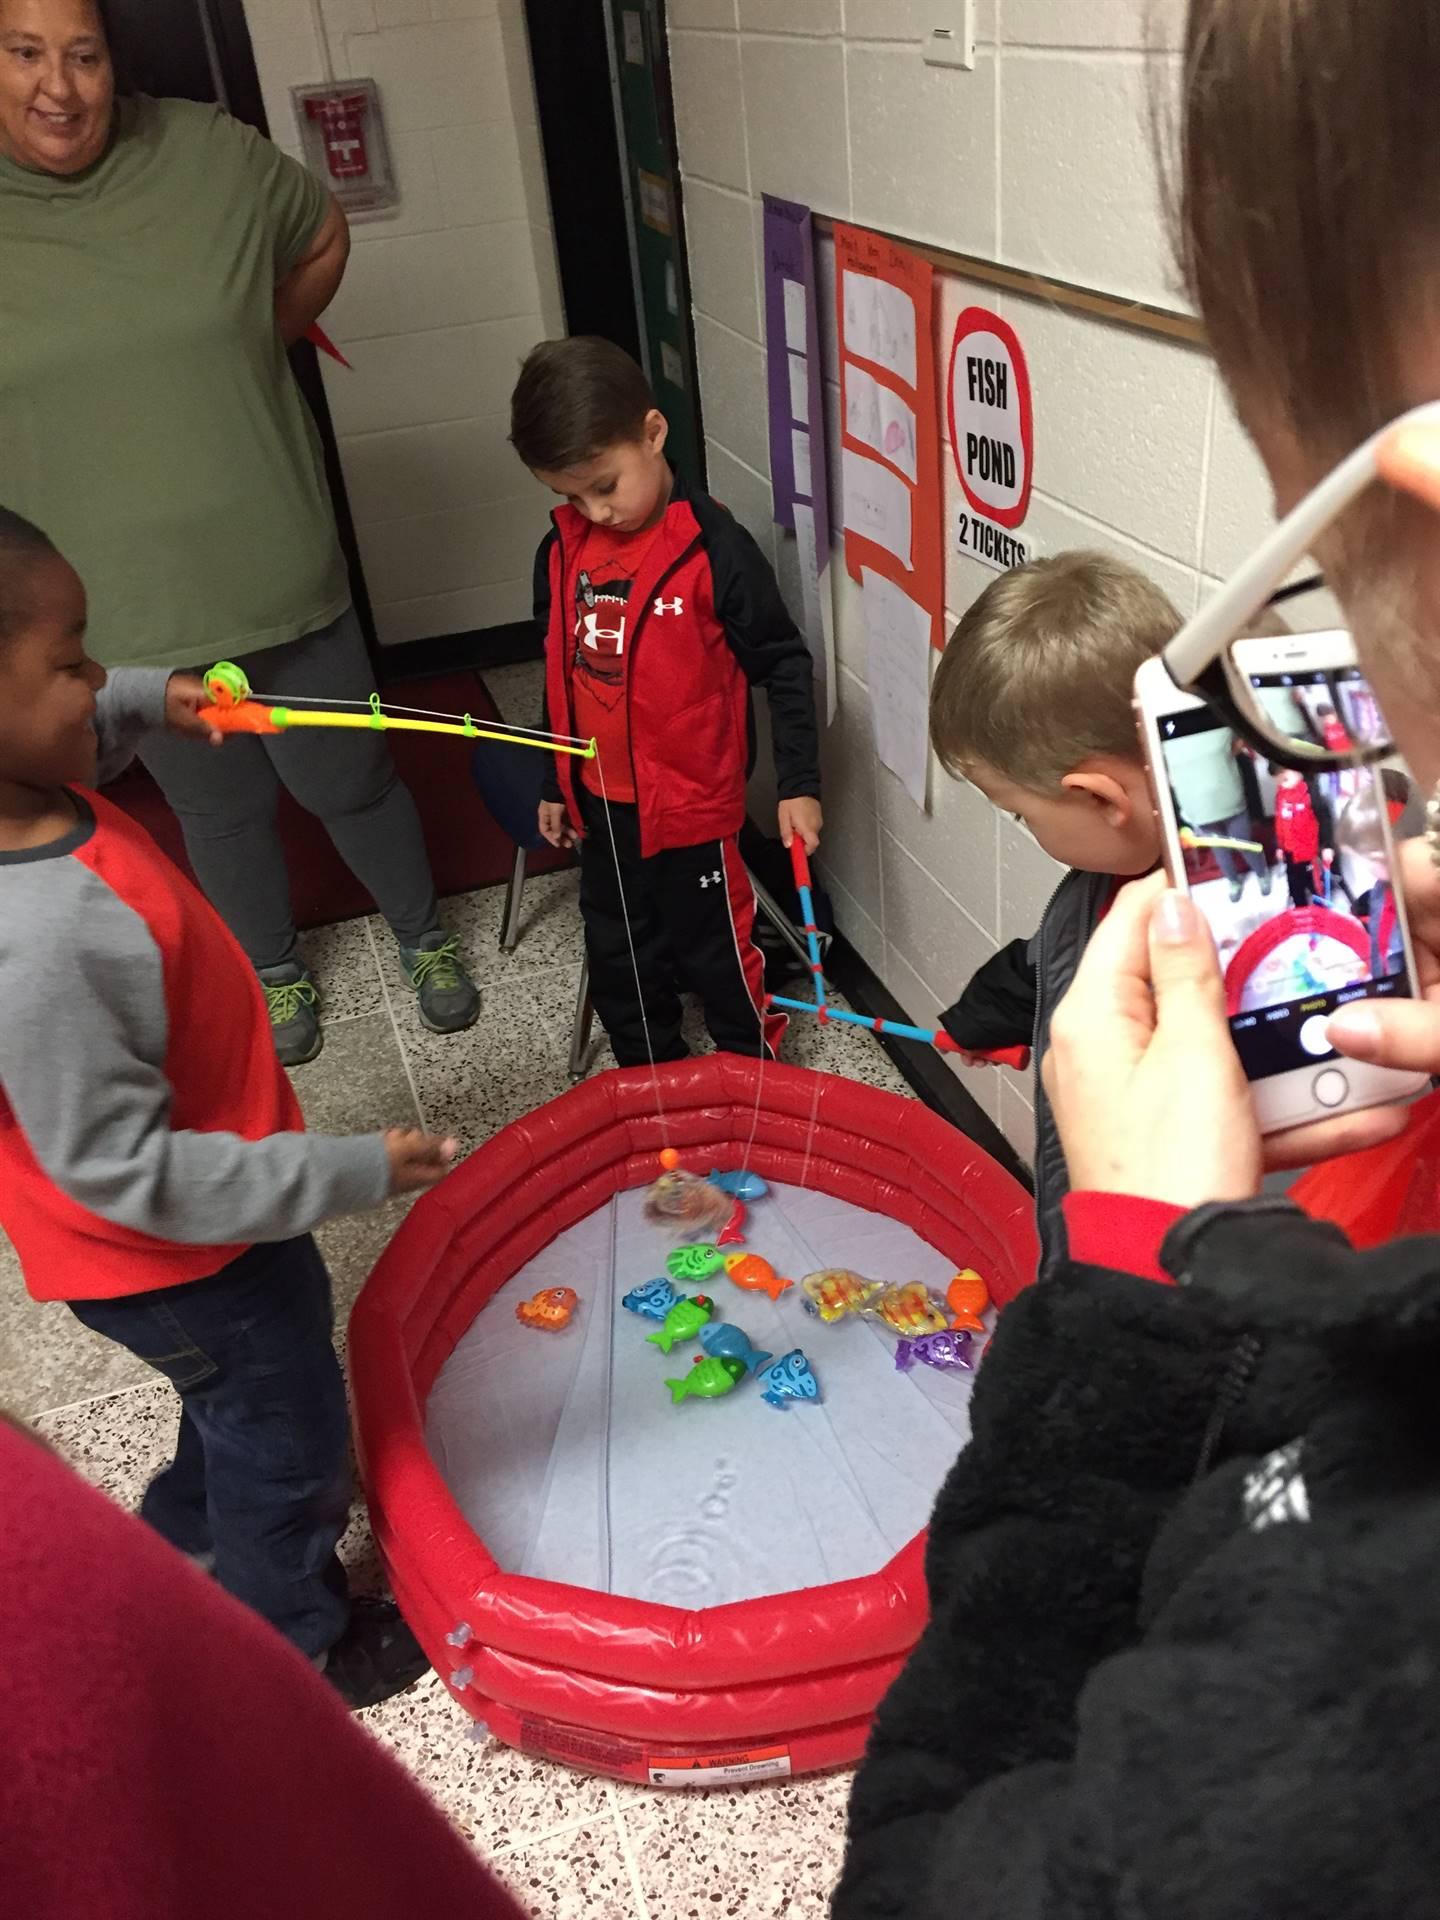 Students enjoying games